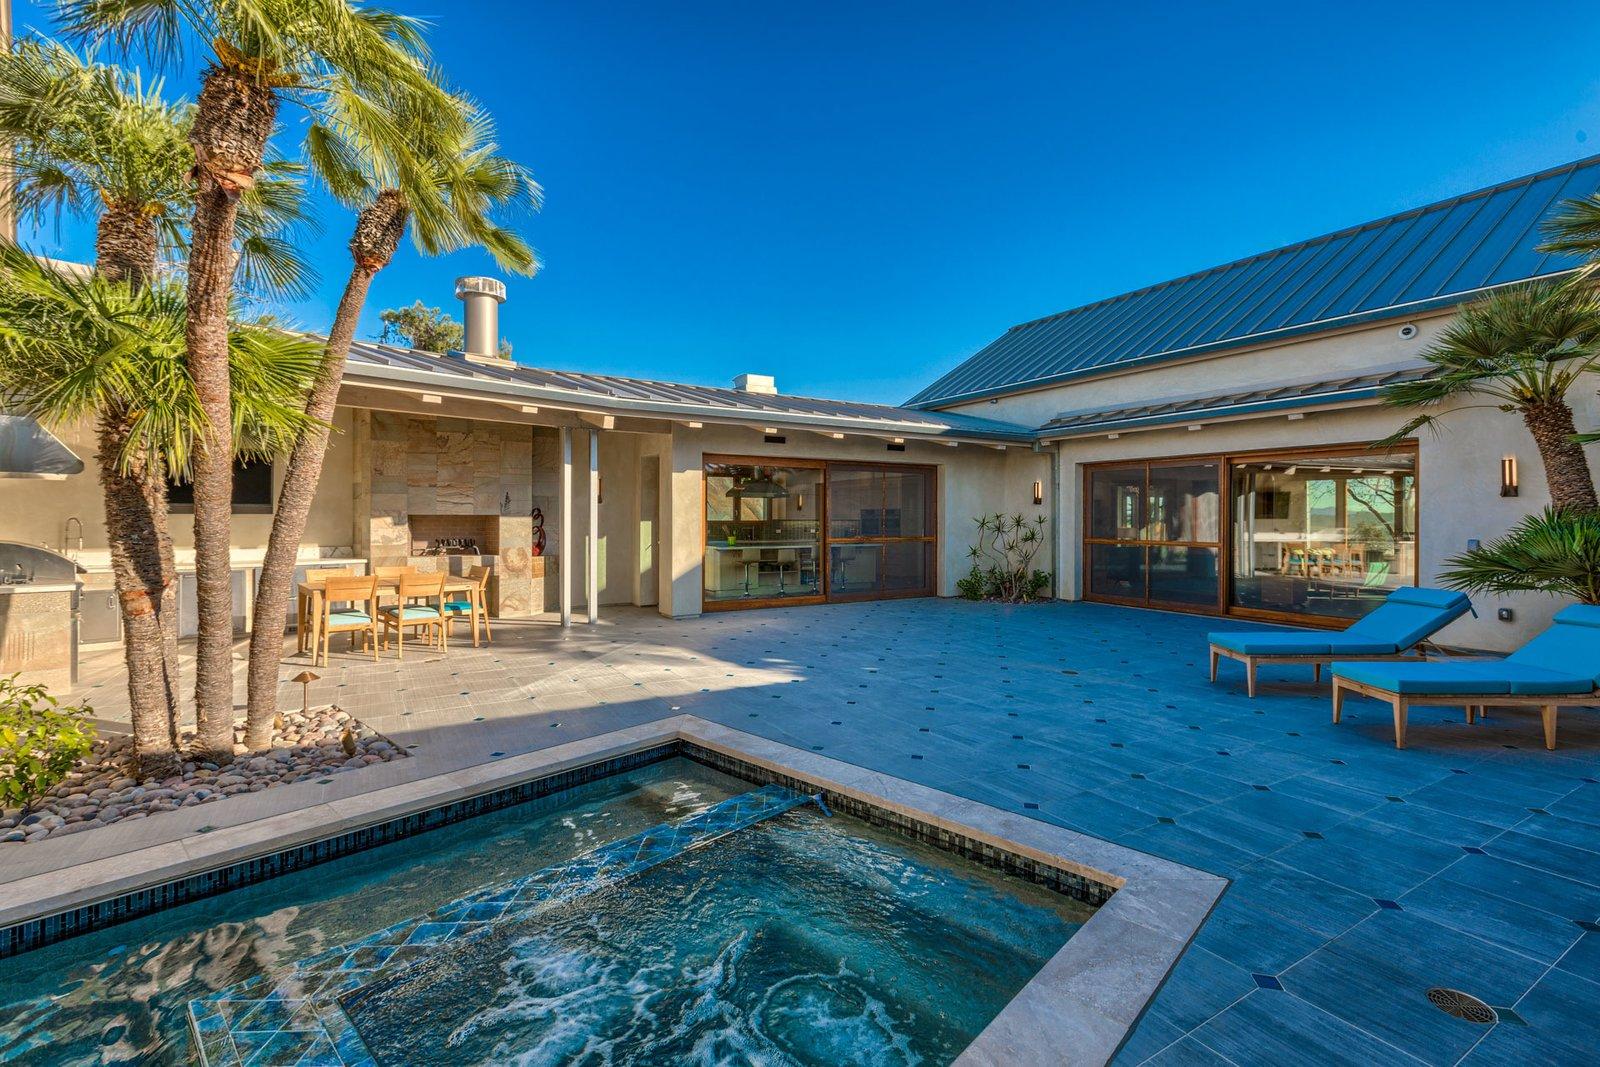 Casa Aguila Pool and Outdoor Living Space Casa Aguila by Maureen Brennan